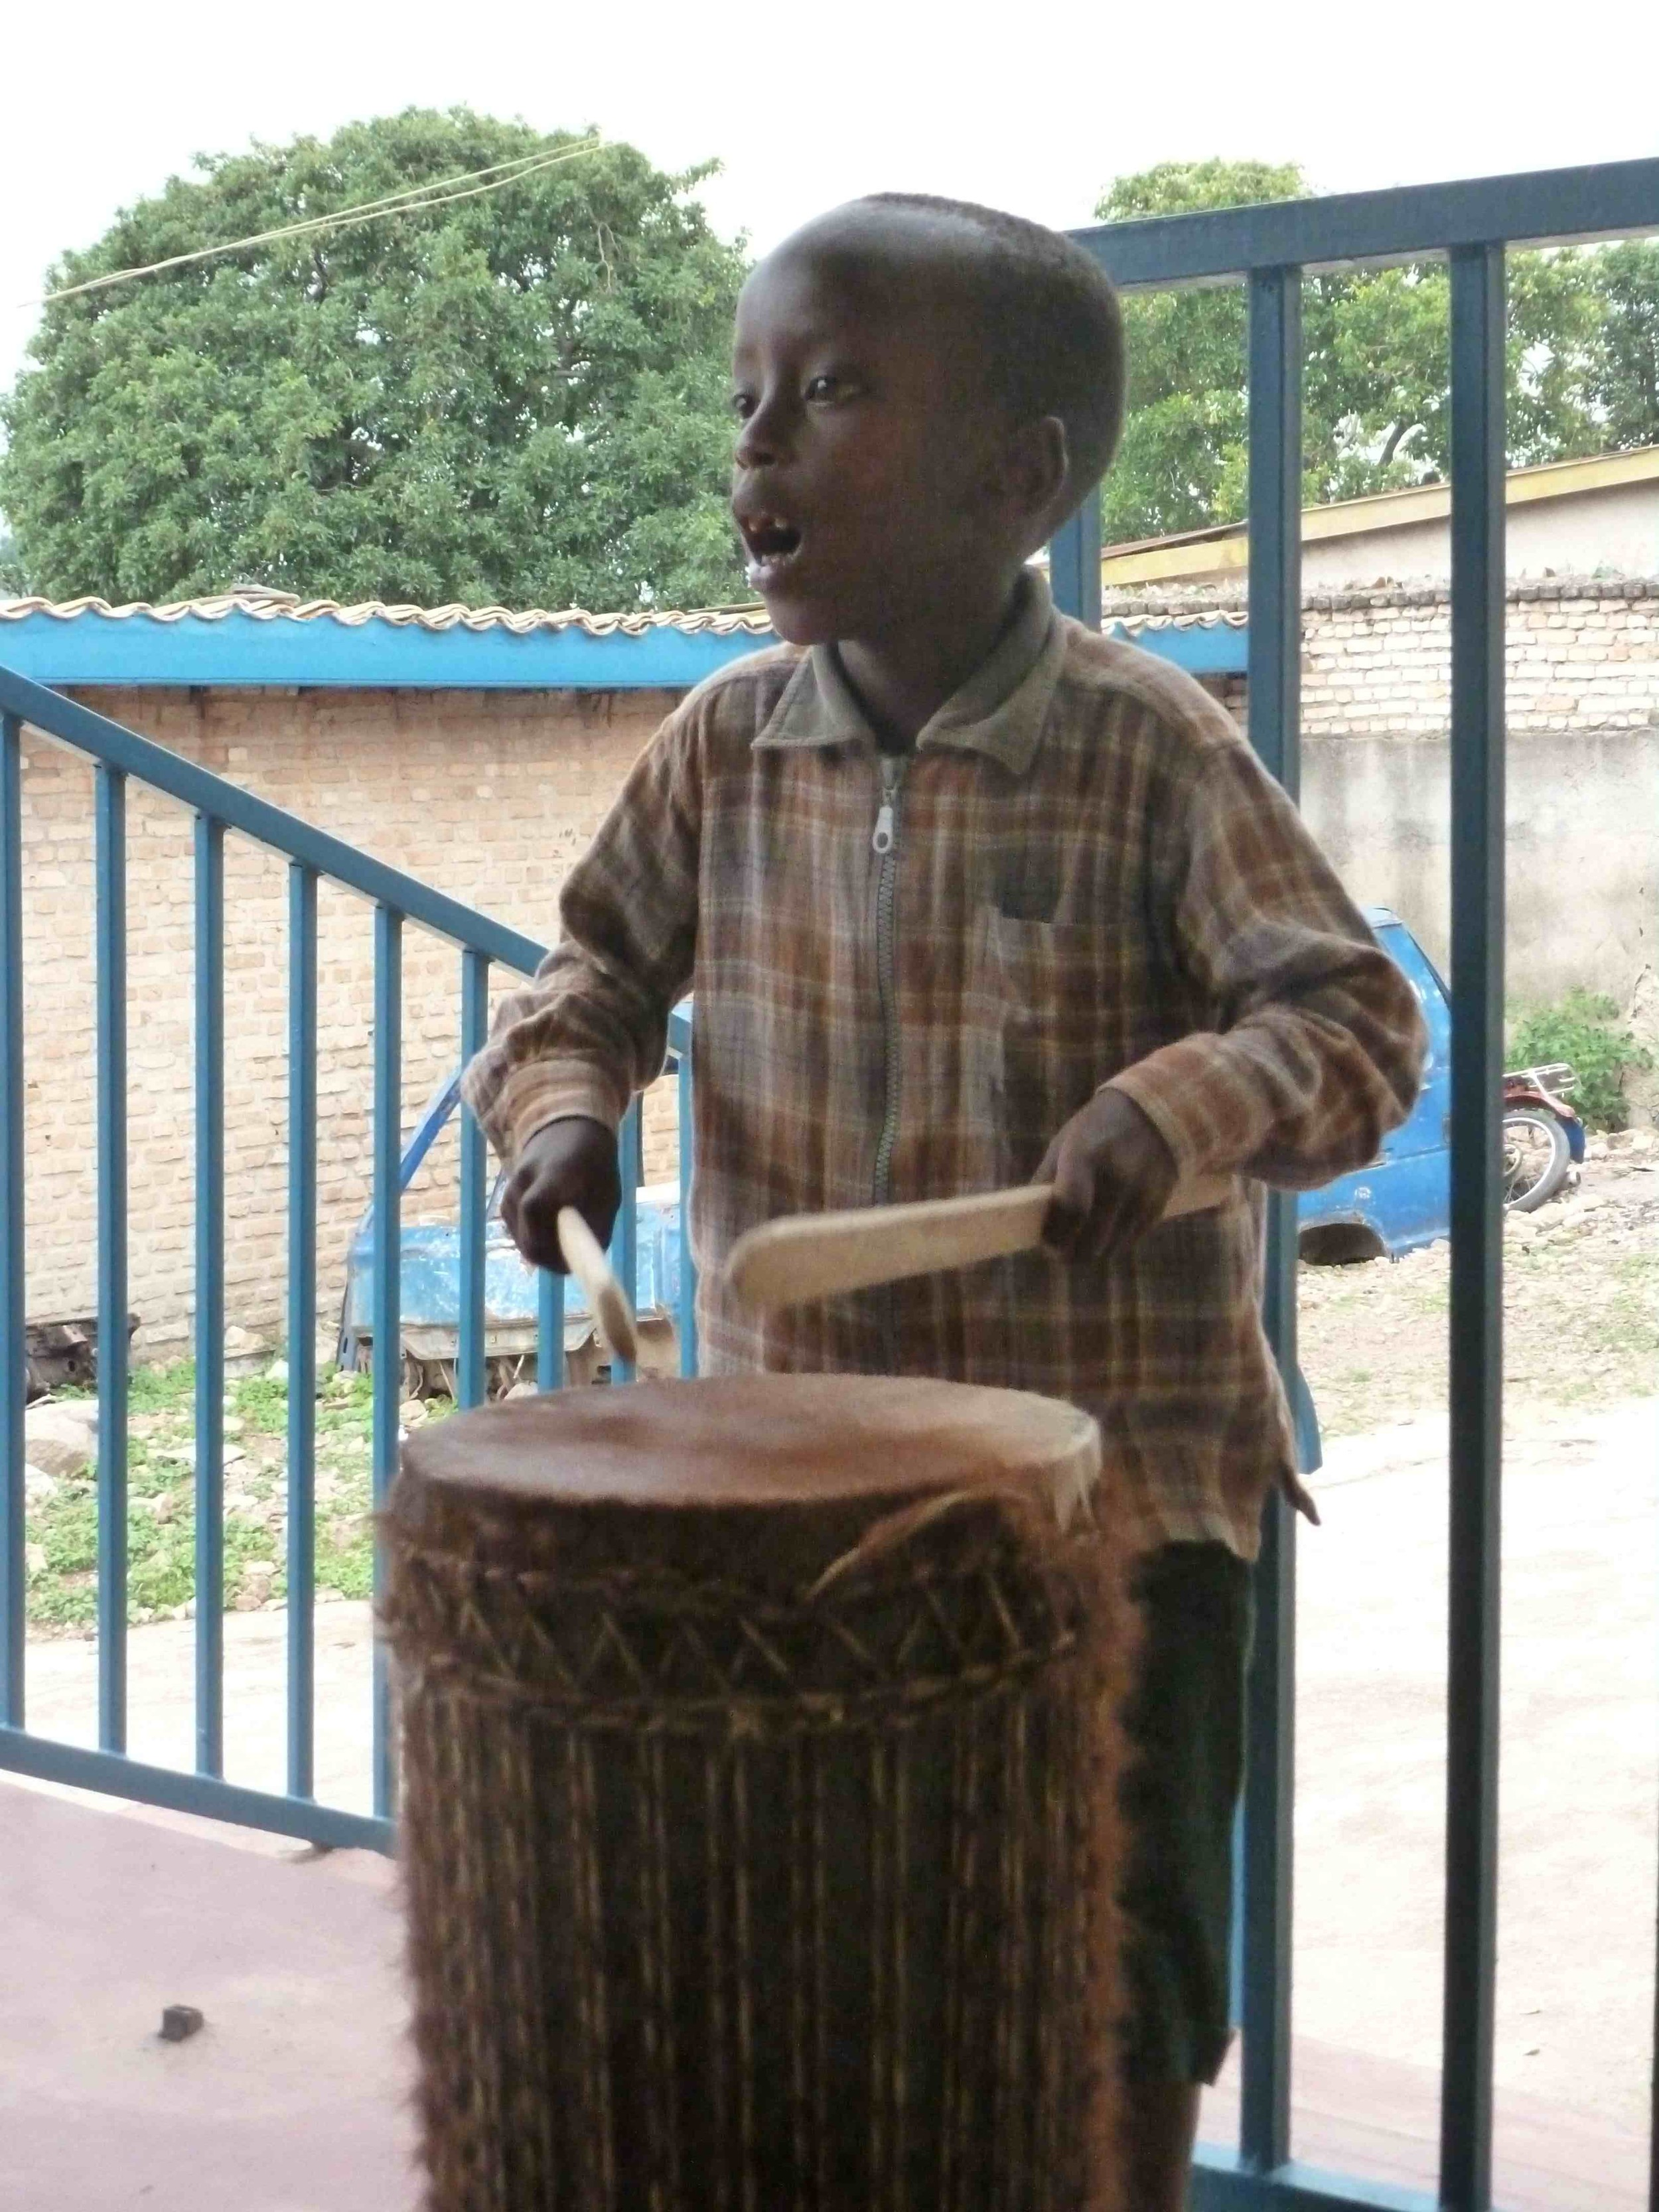 This 4-year-old kept everyone dancing!